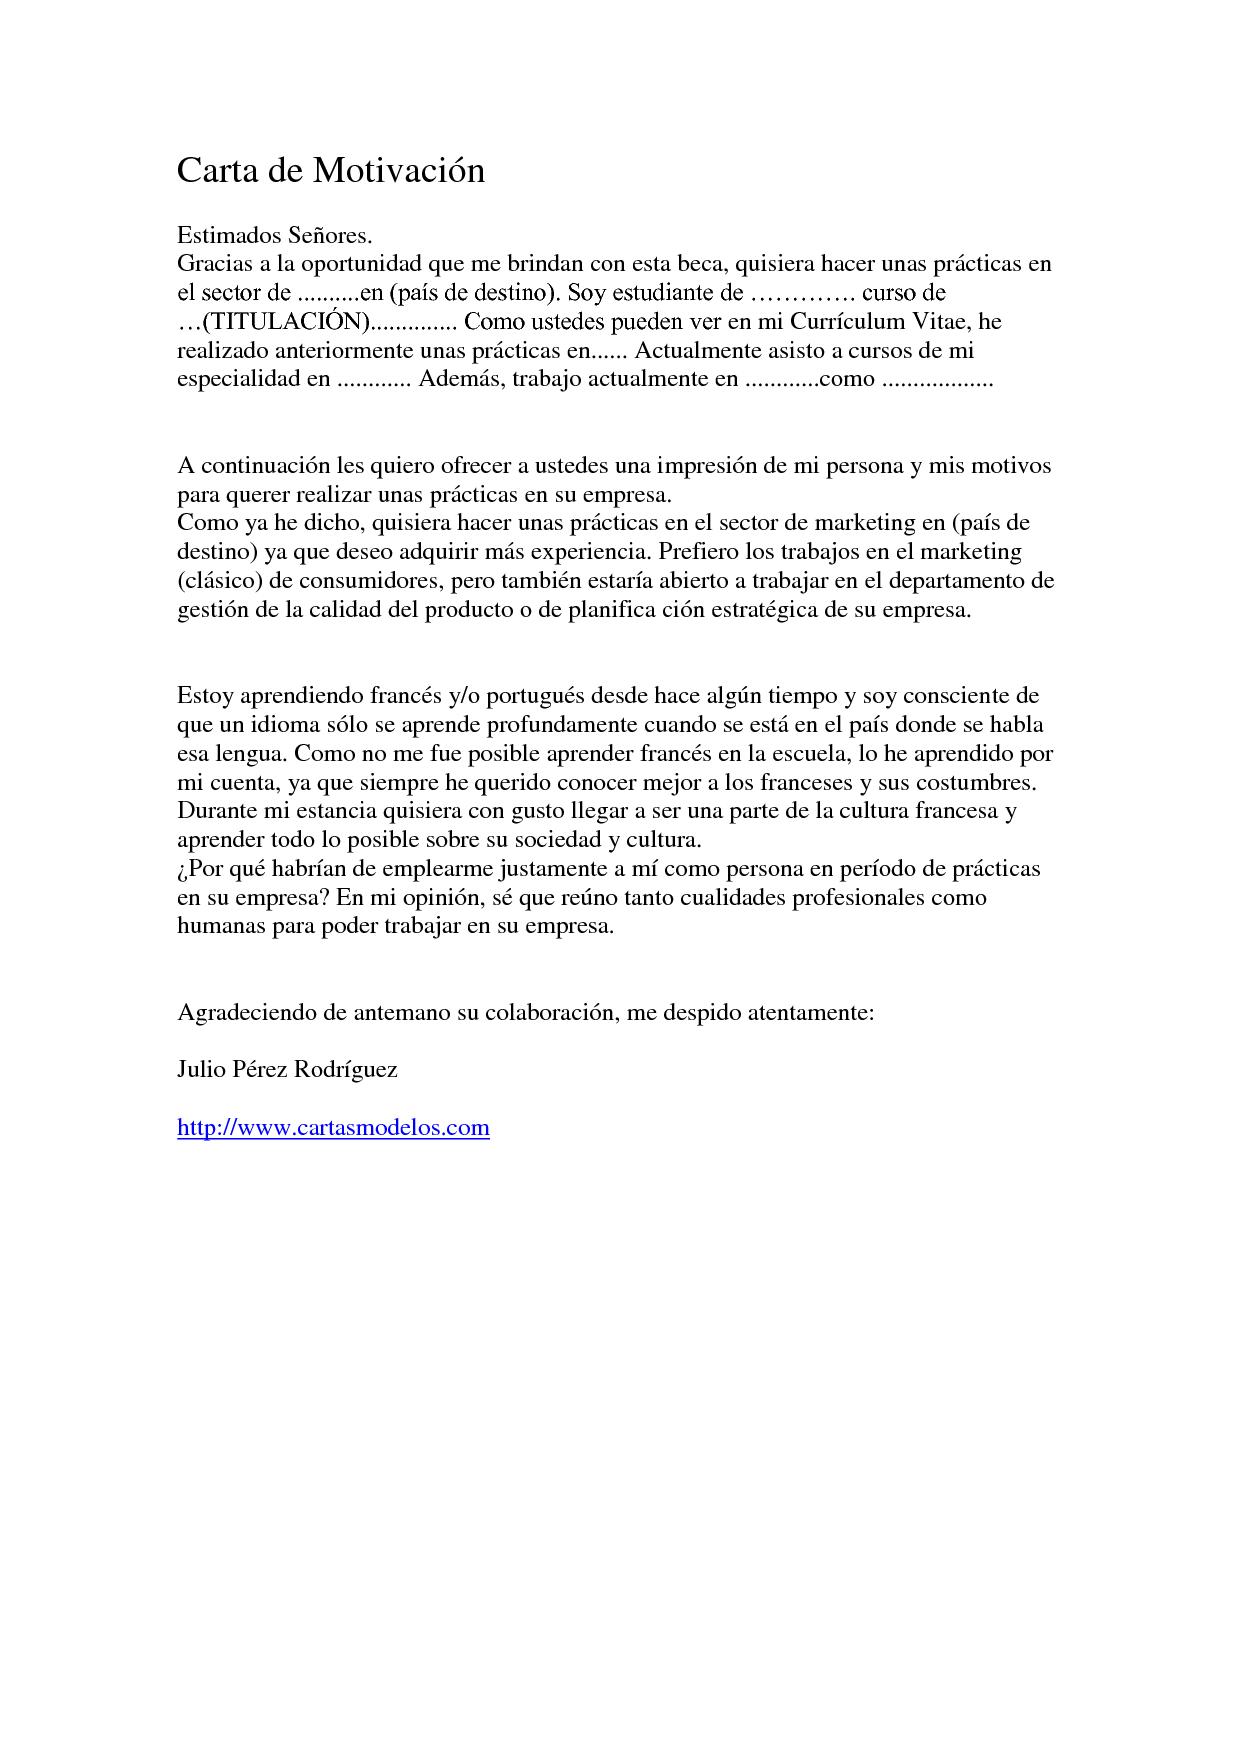 carta de motivaci u00f3n